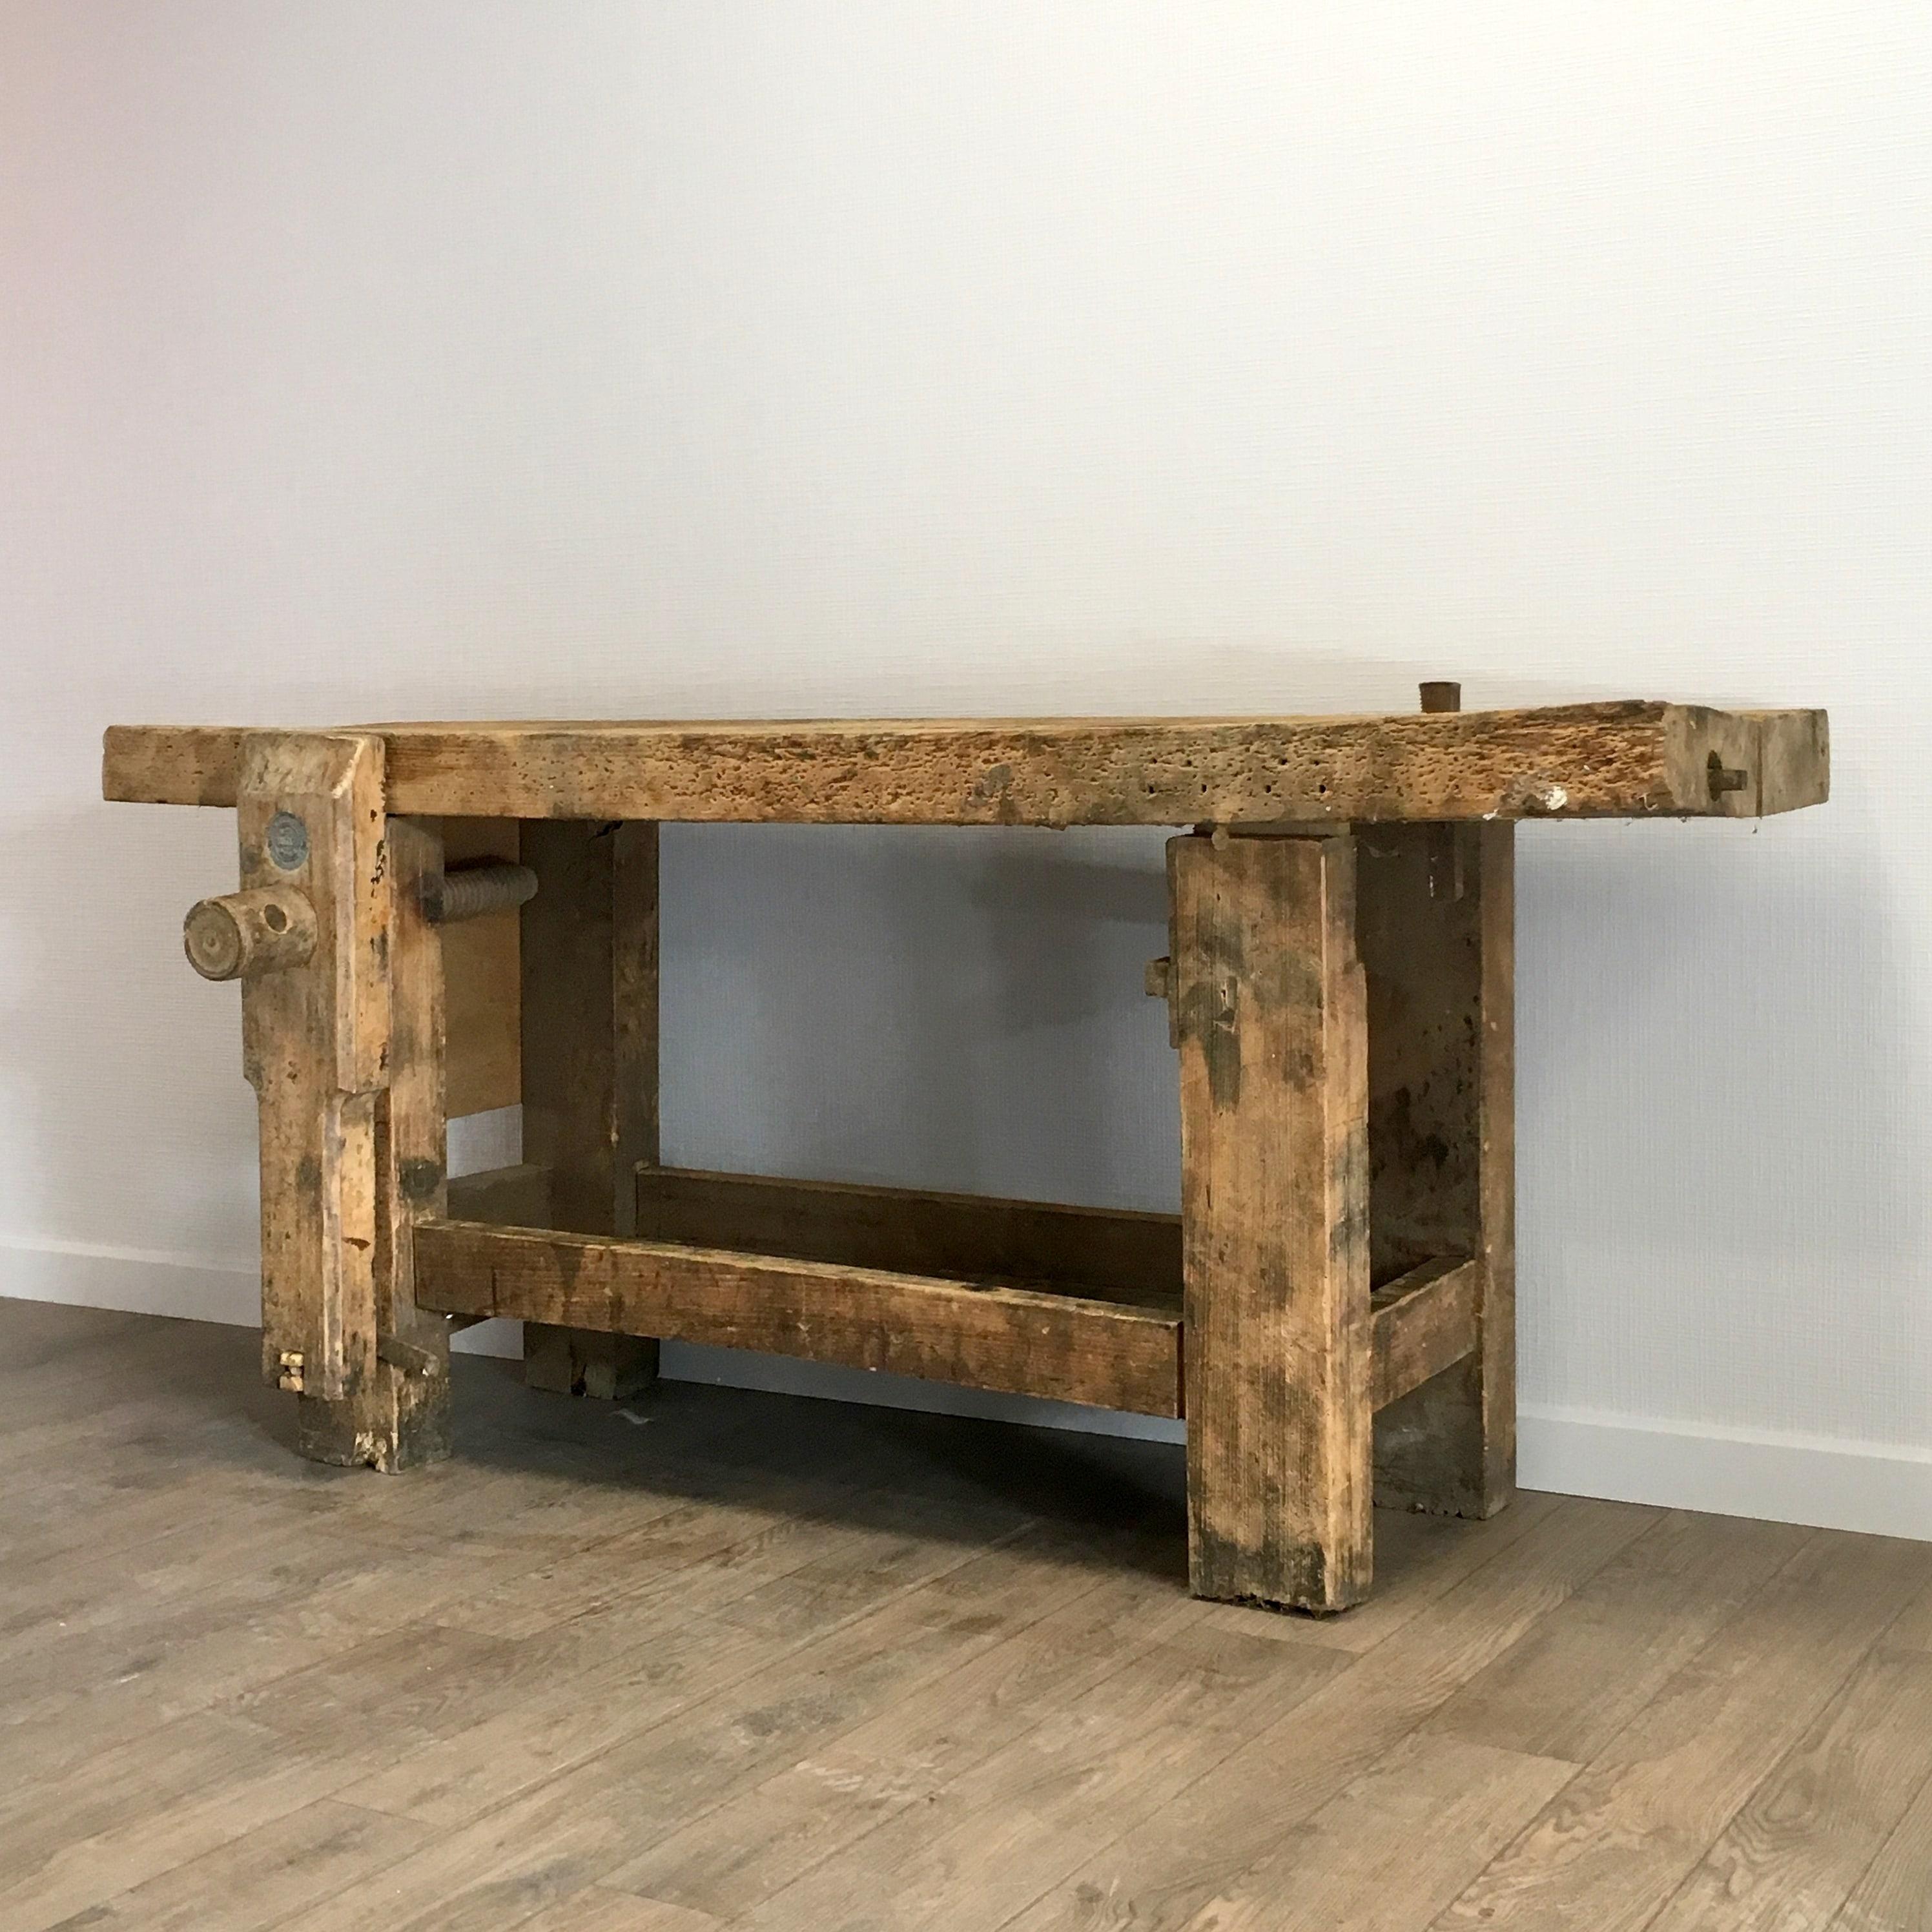 ancien tabli en bois lignedebrocante brocante en ligne chine pour vous meubles vintage et. Black Bedroom Furniture Sets. Home Design Ideas